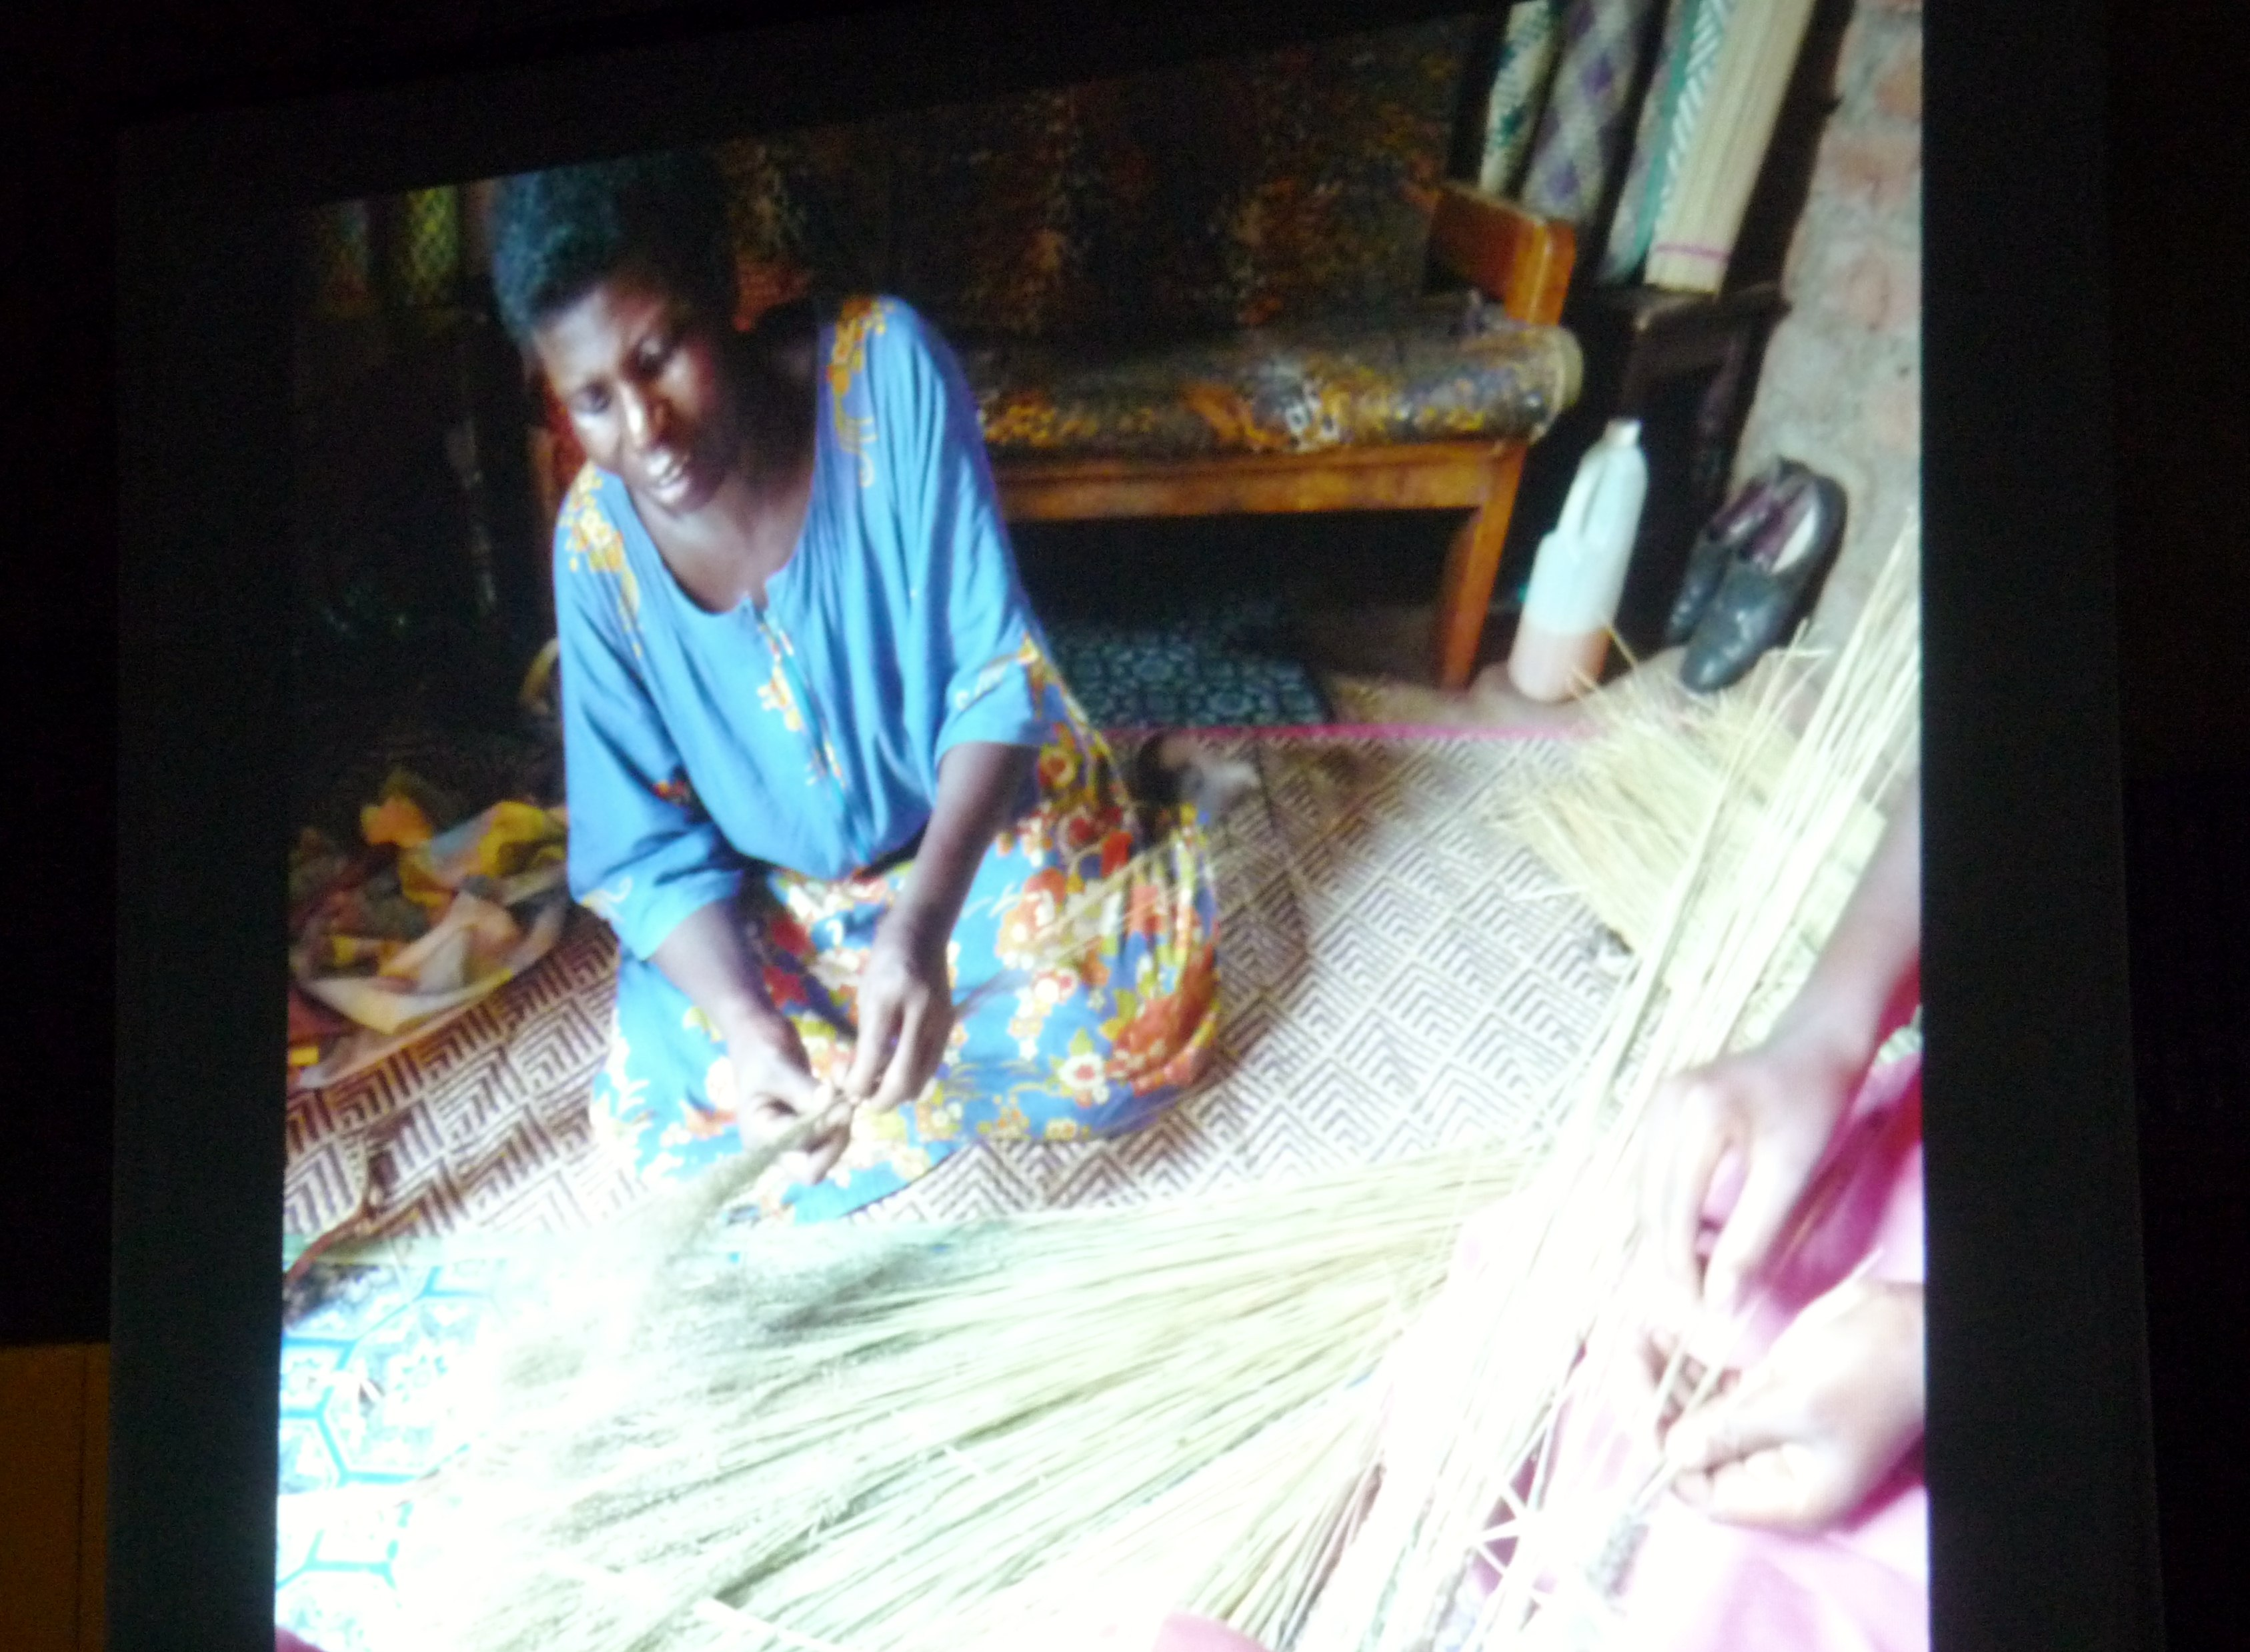 slide by Bobby Britnall showing a Ugandan woman making a broom